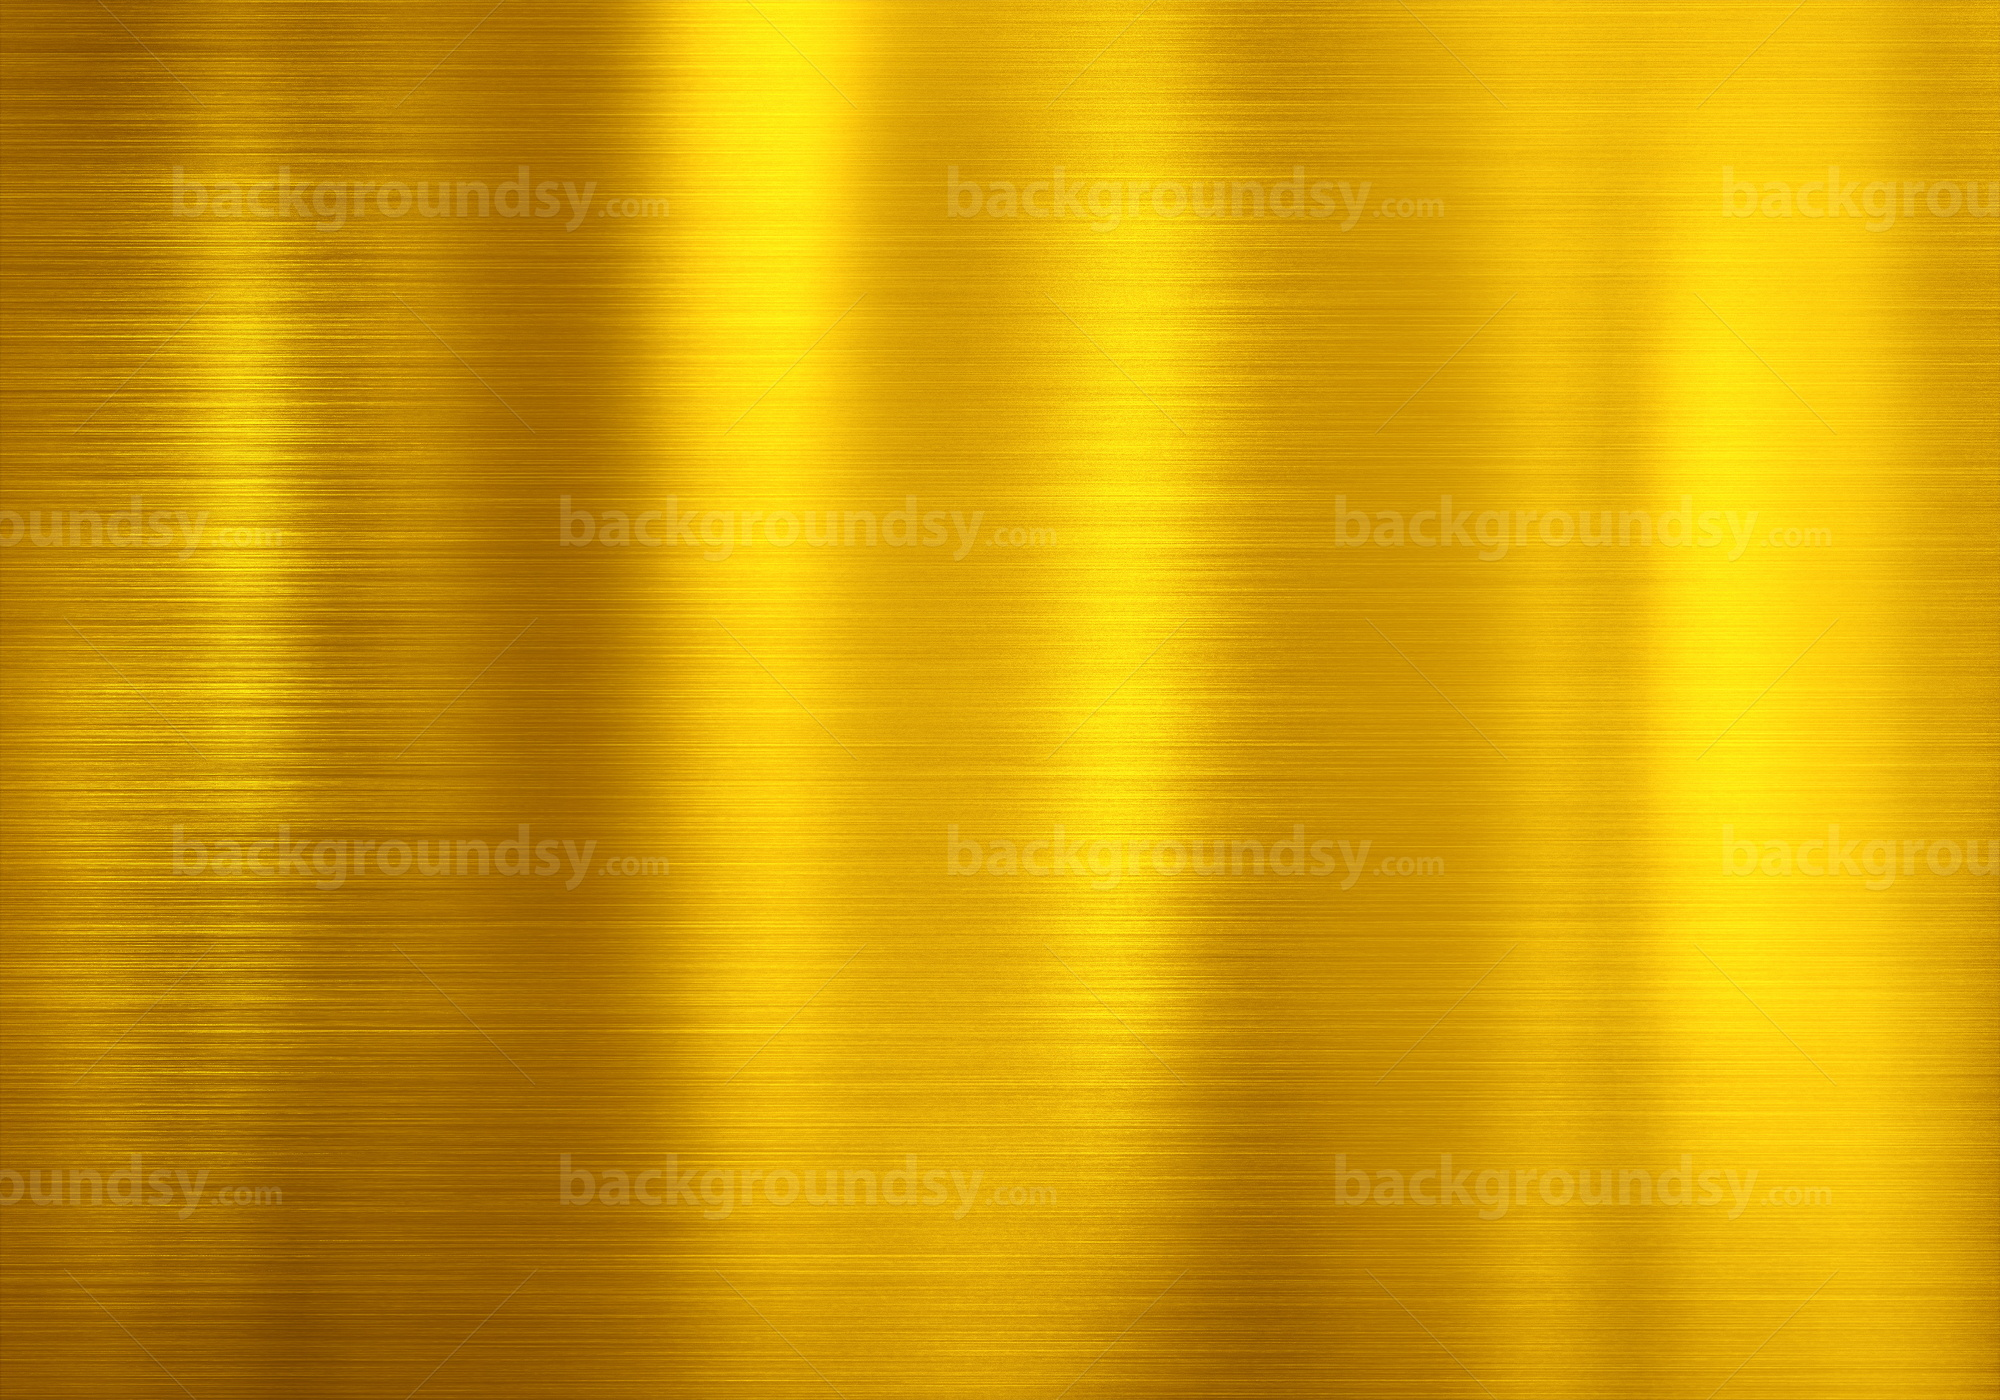 Golden Texture Backgroundsy Com